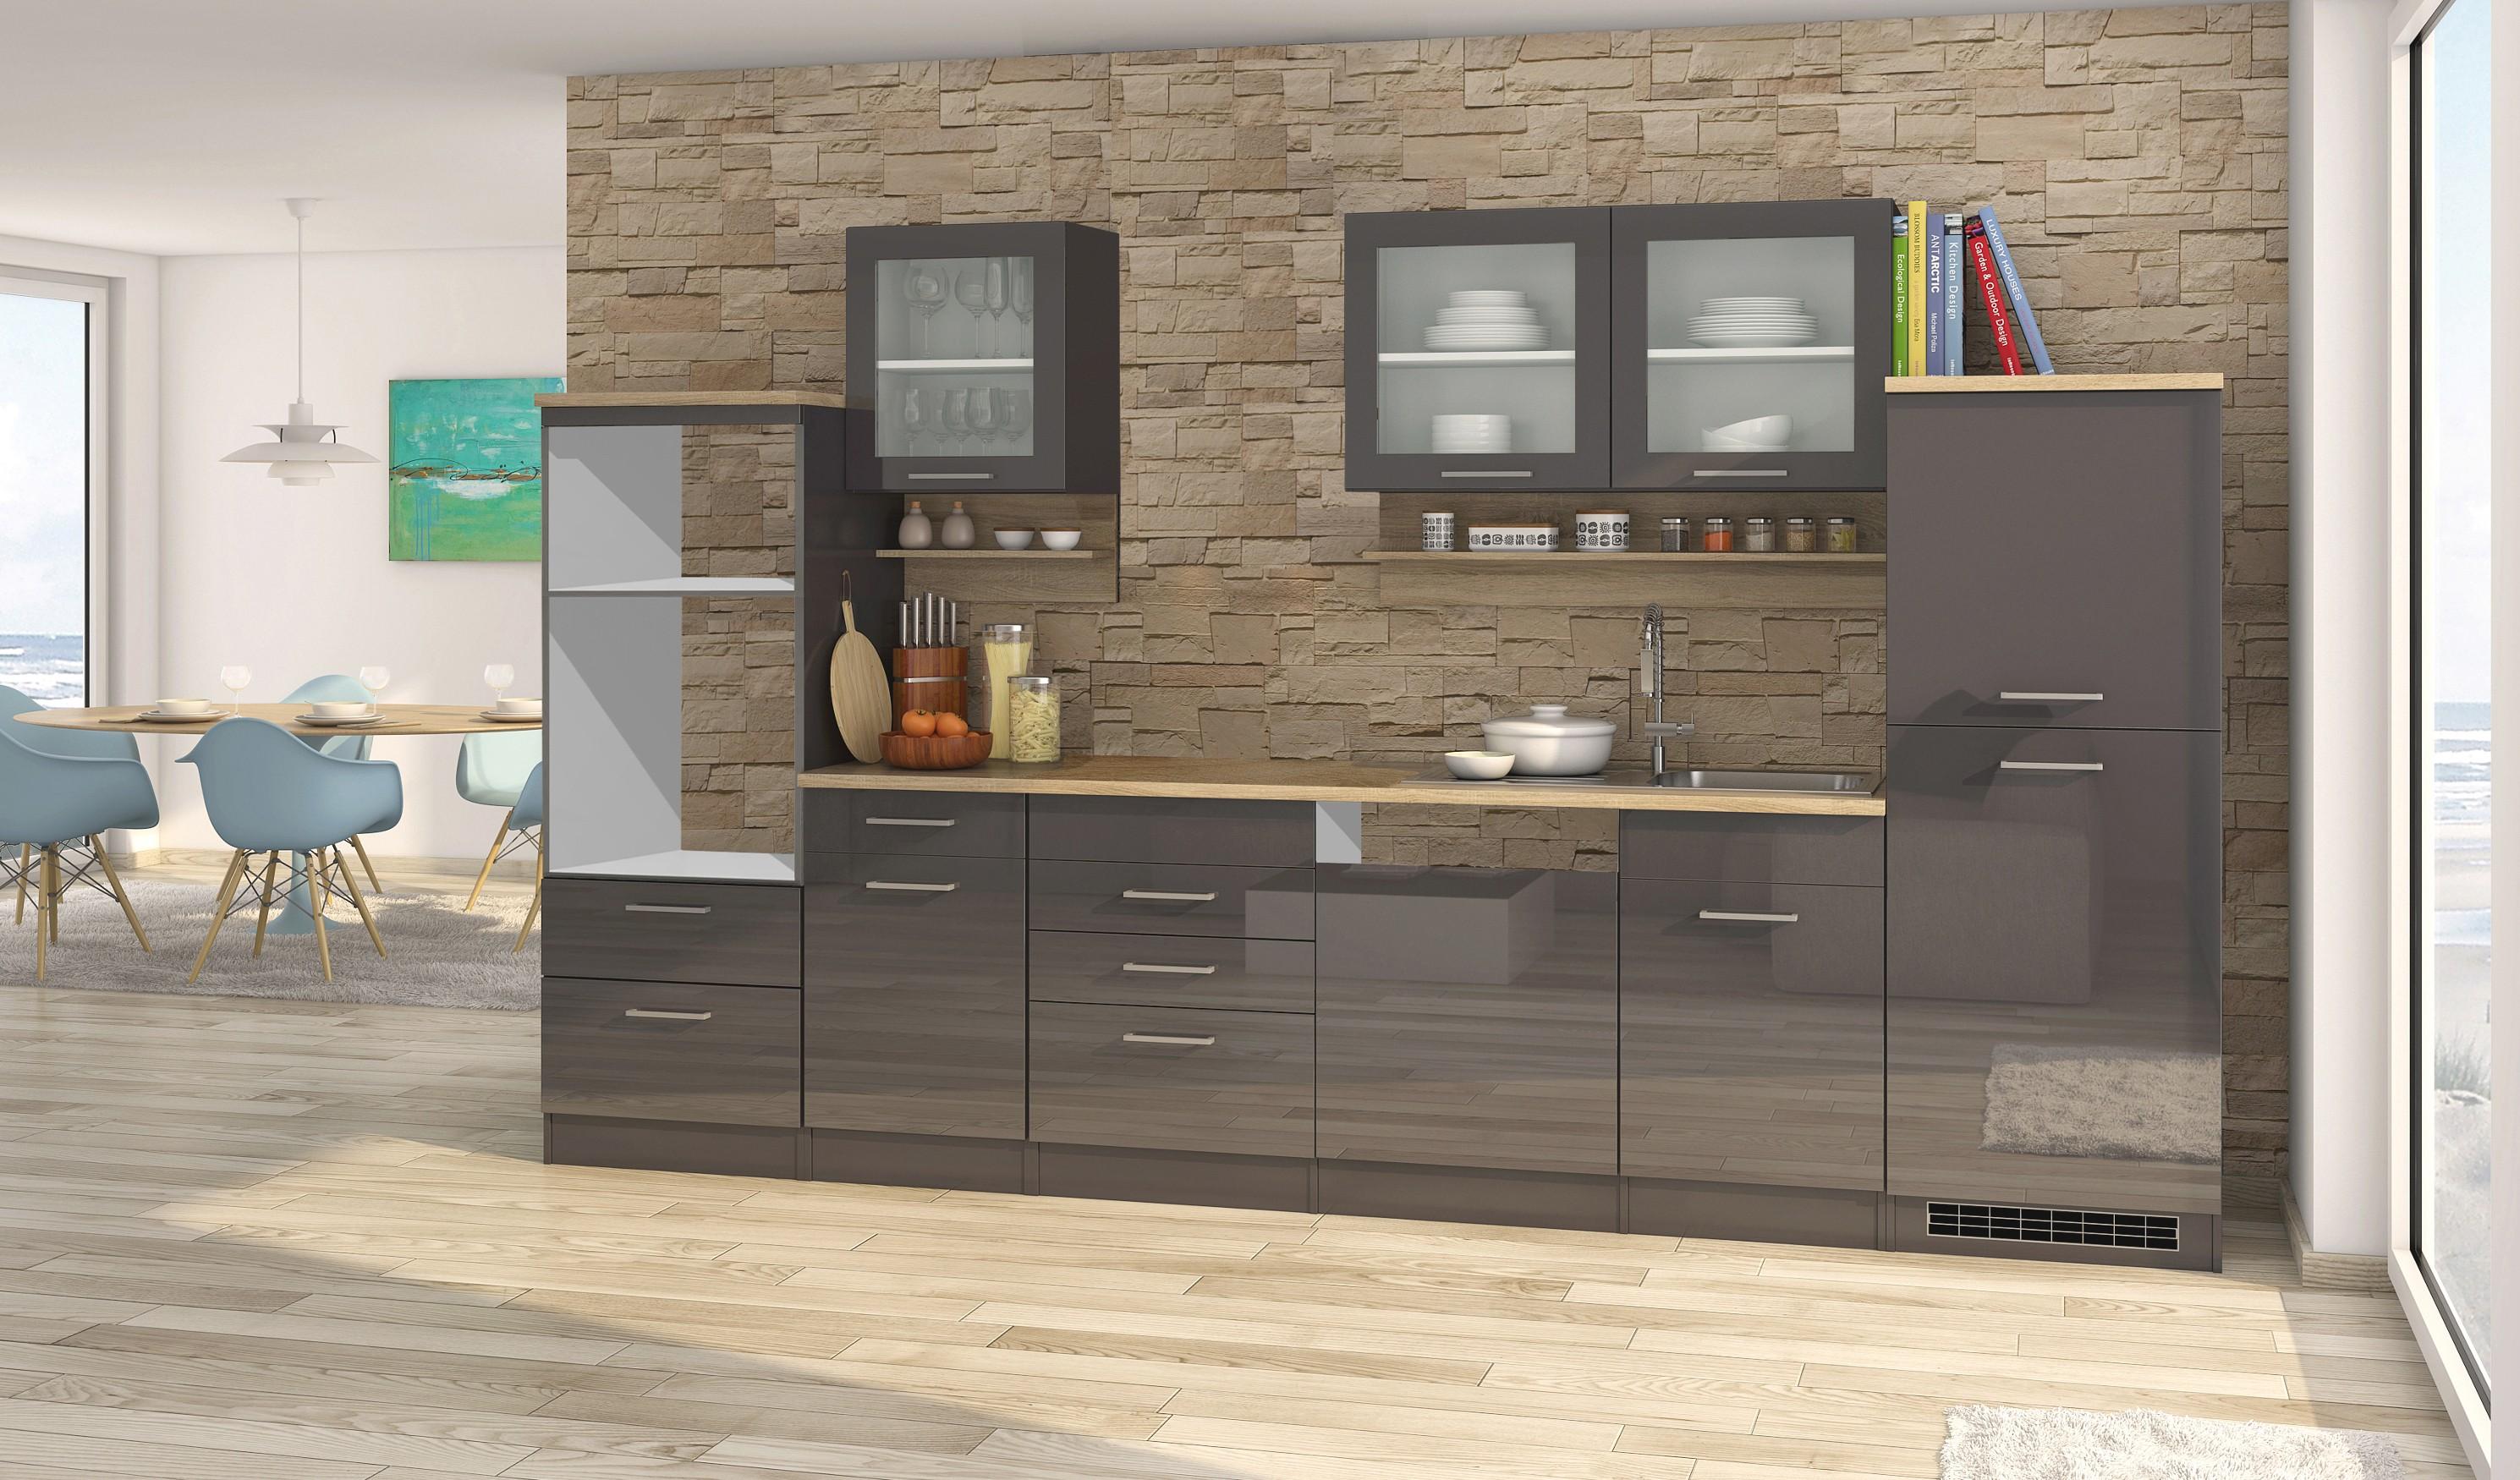 k chenzeile ohne ger te einbauk che ohne elektroger te 340. Black Bedroom Furniture Sets. Home Design Ideas